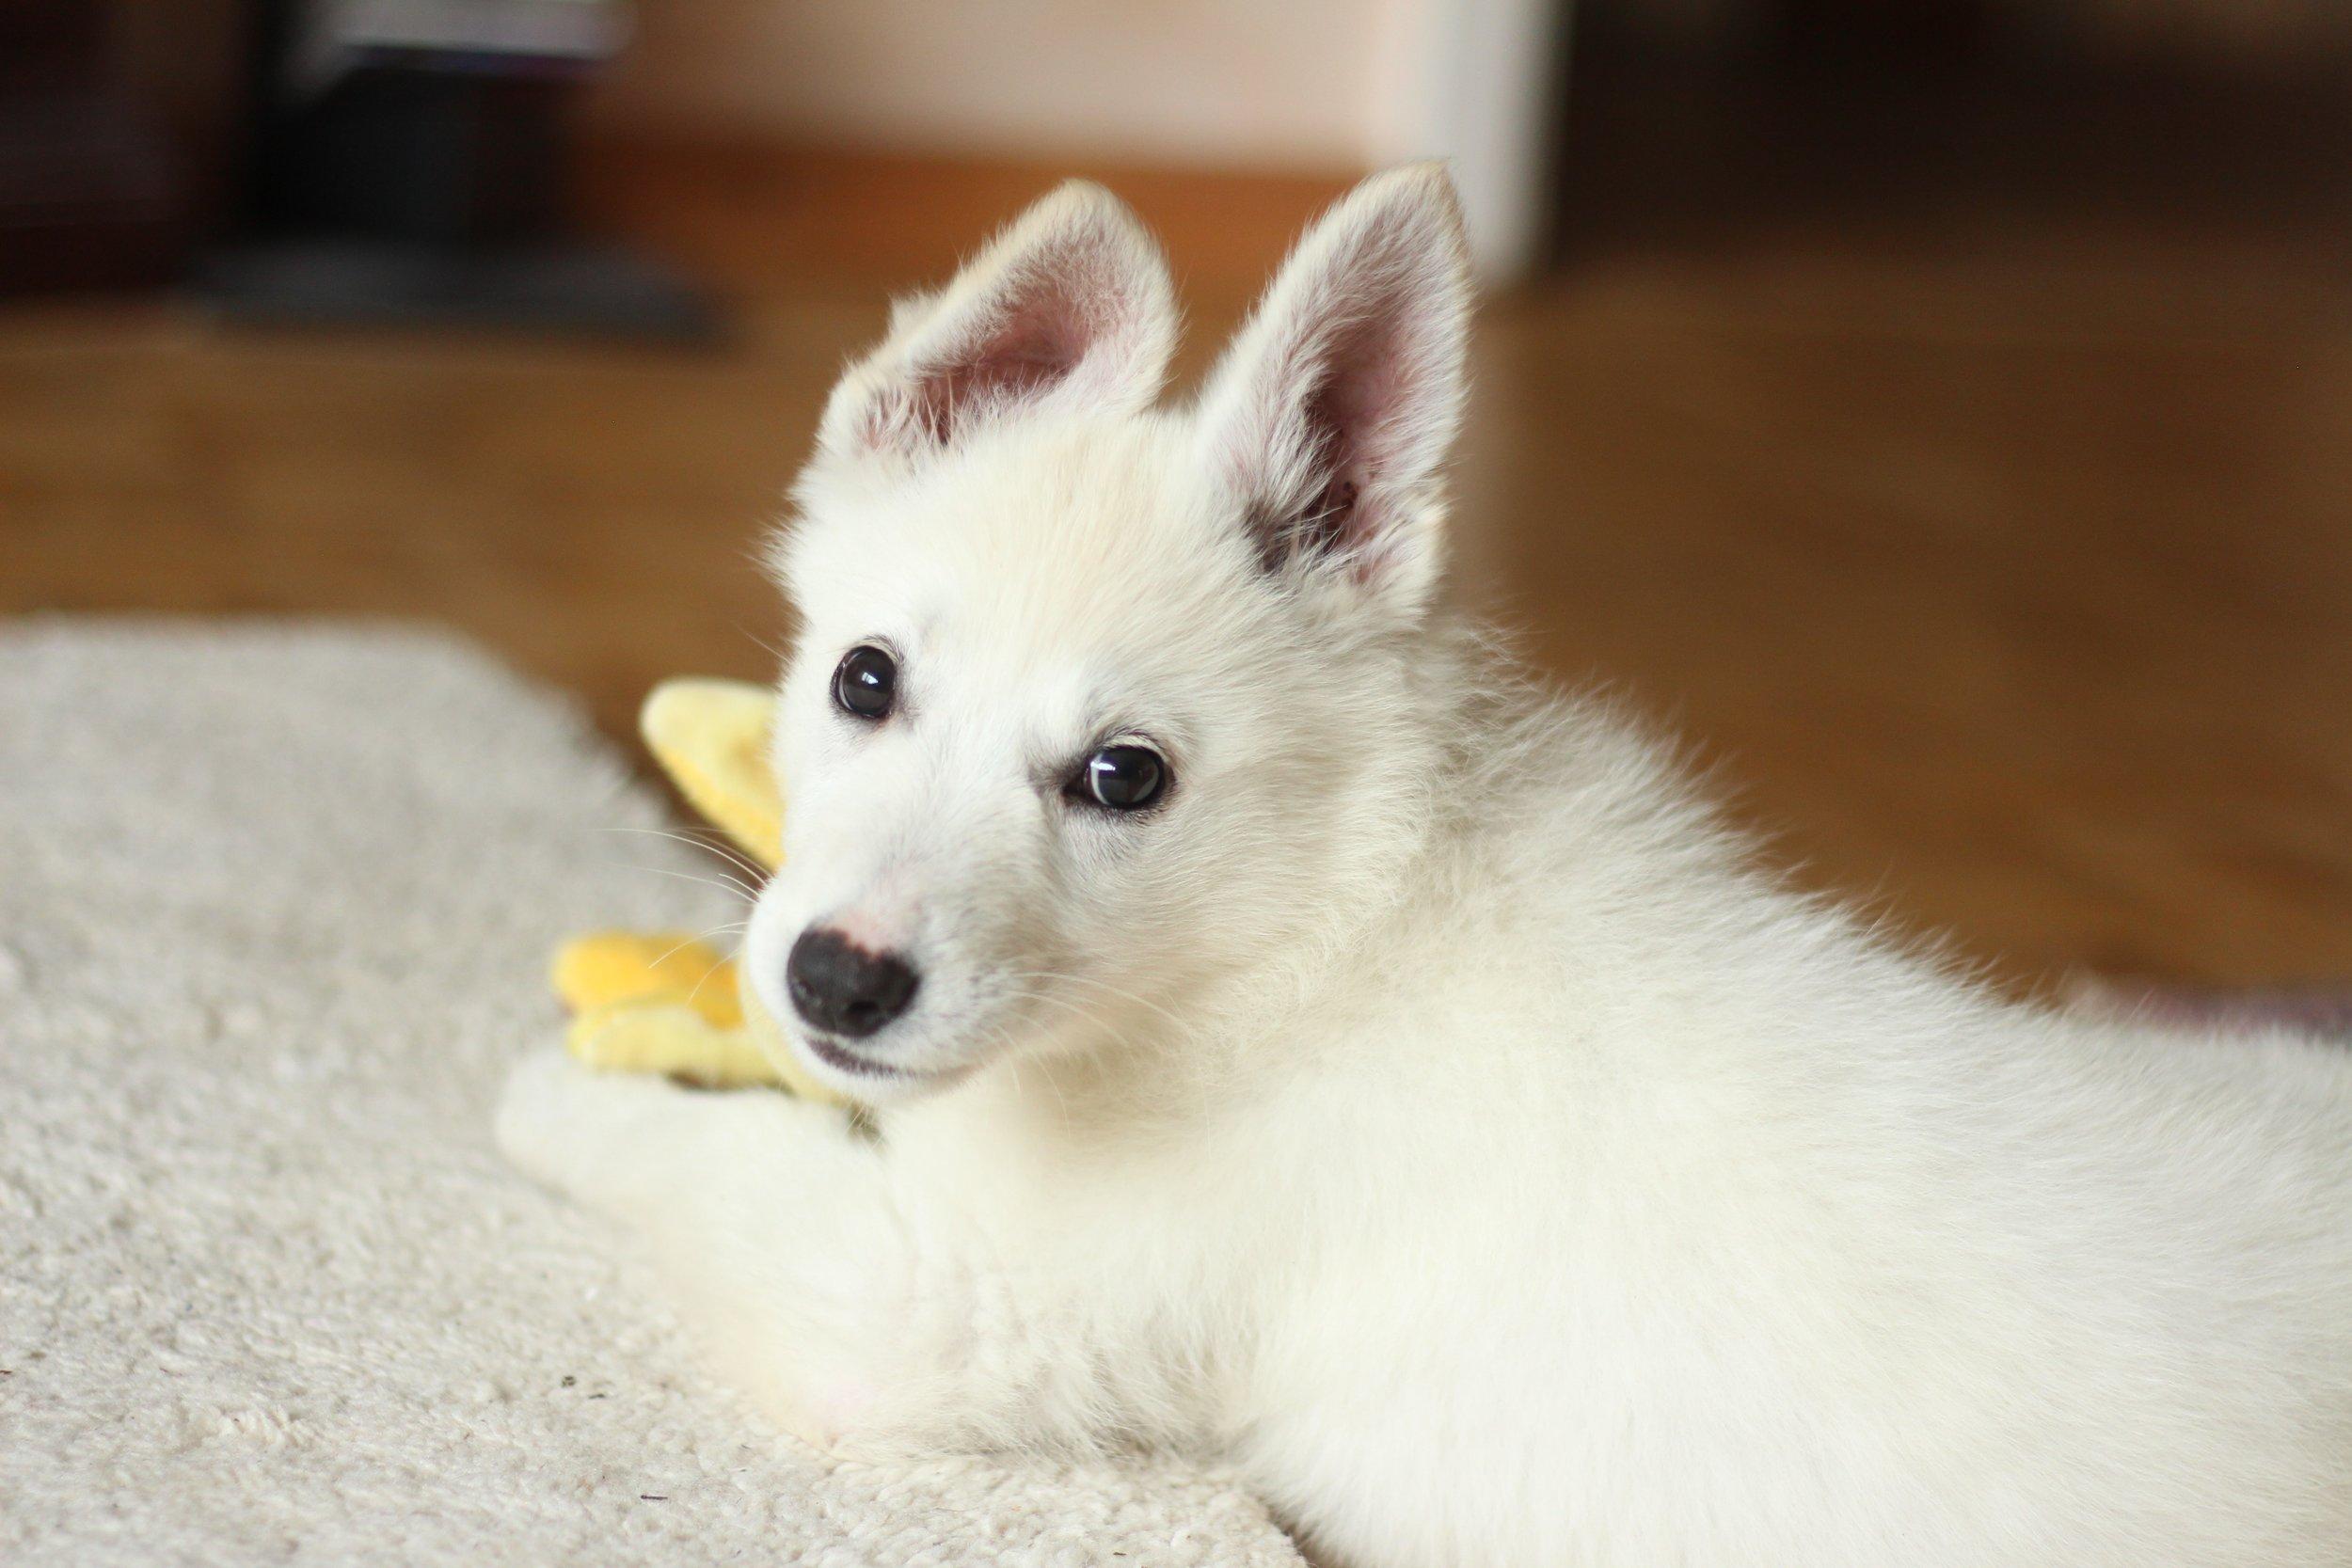 adorable-animal-breed-846083.jpg